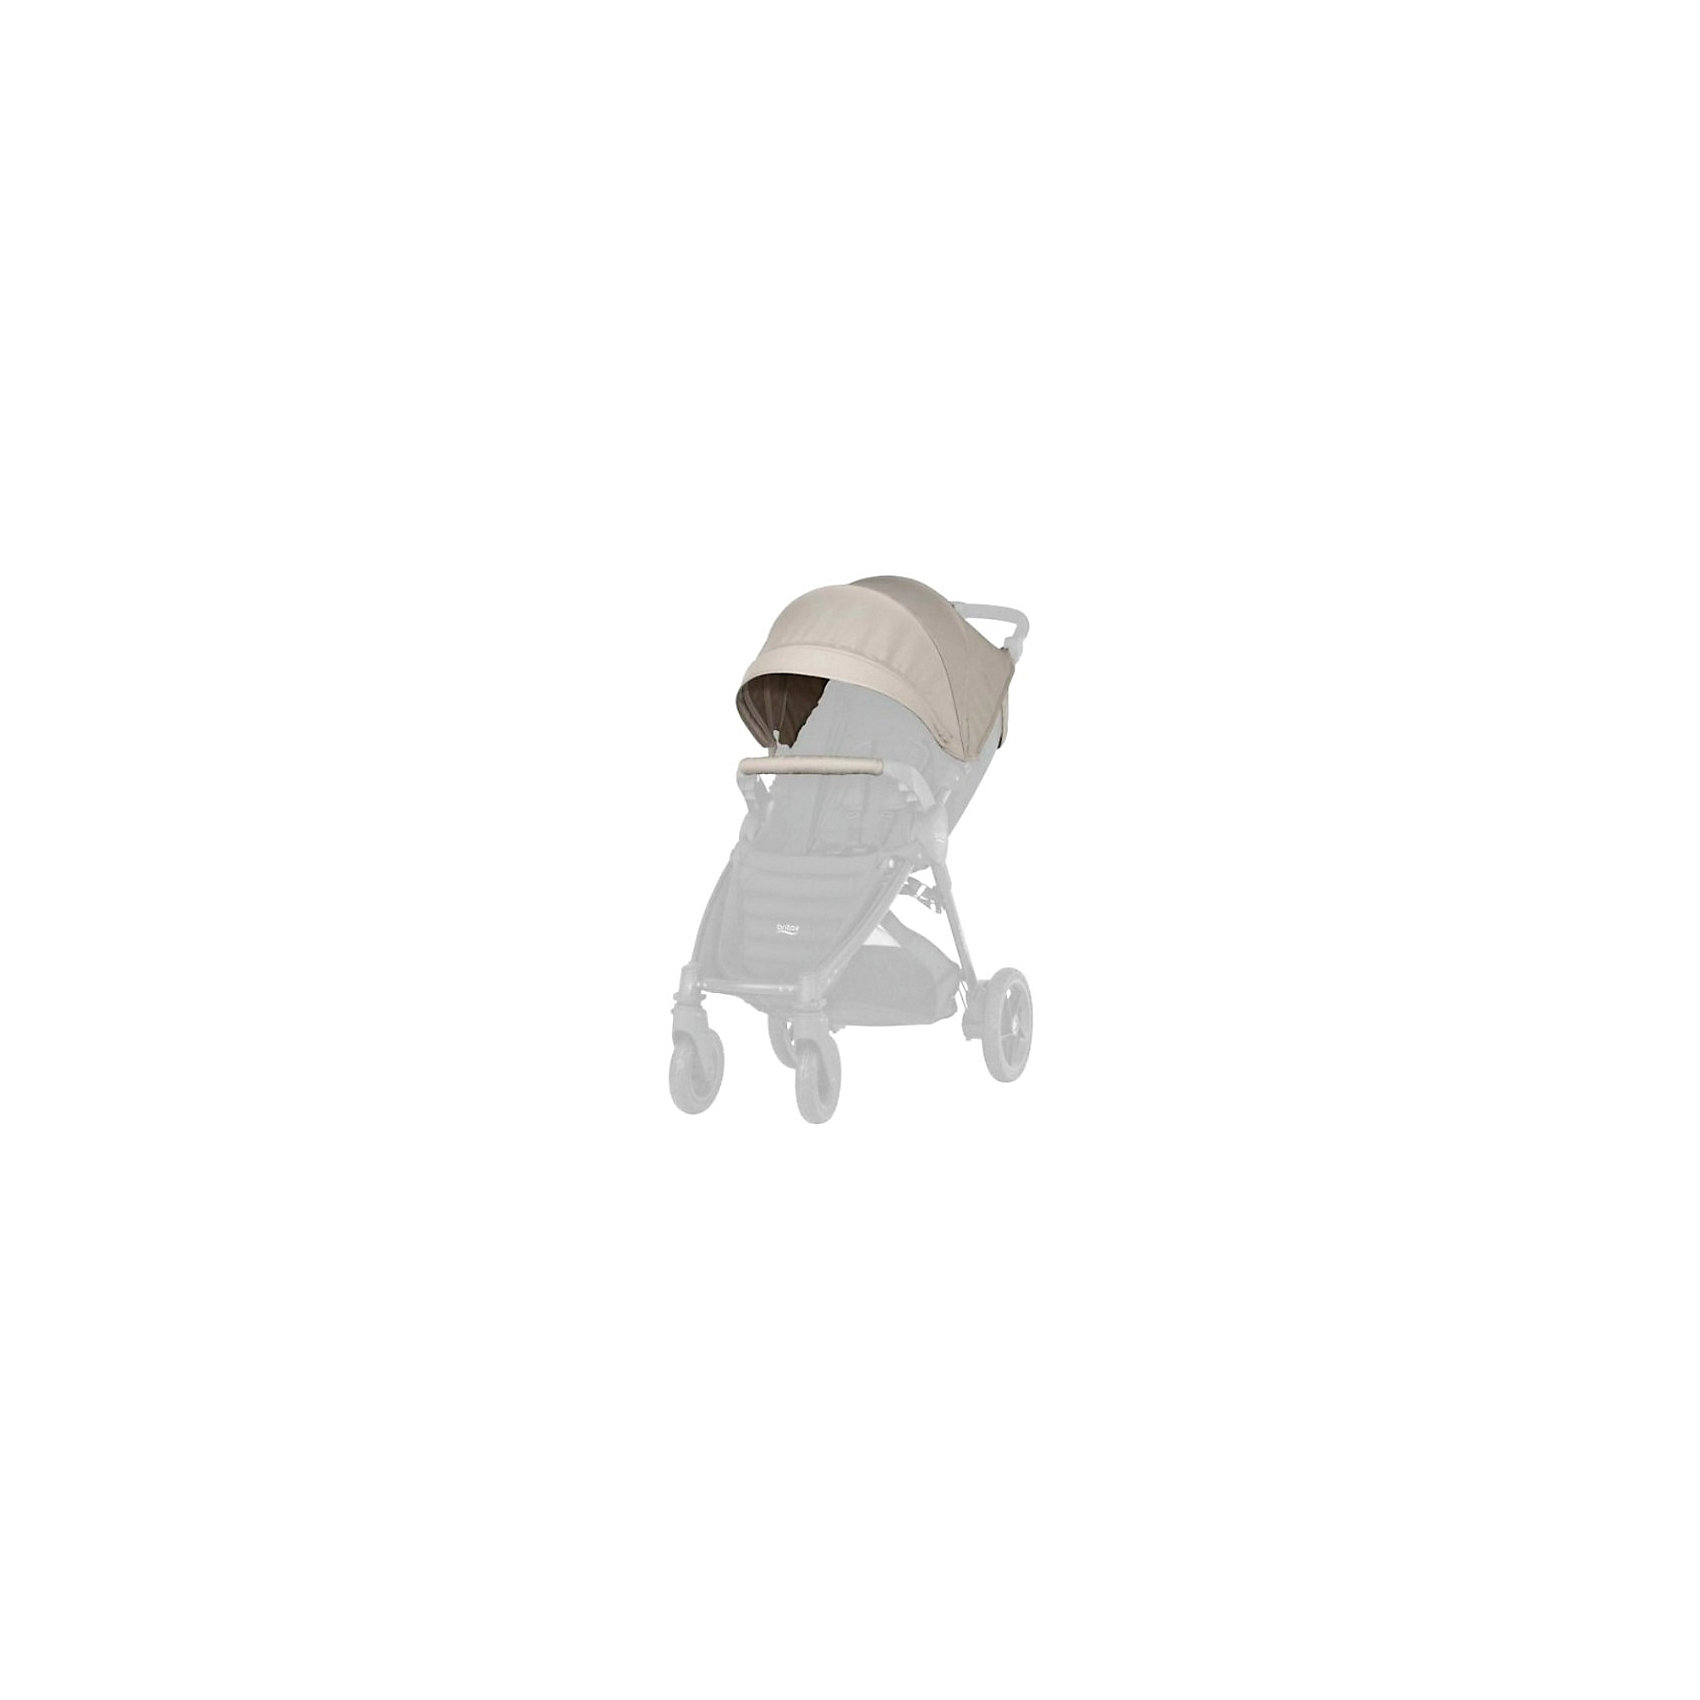 Капор для прогулочной коляски B-Agile/B-Motion, Britax, Sand Beige